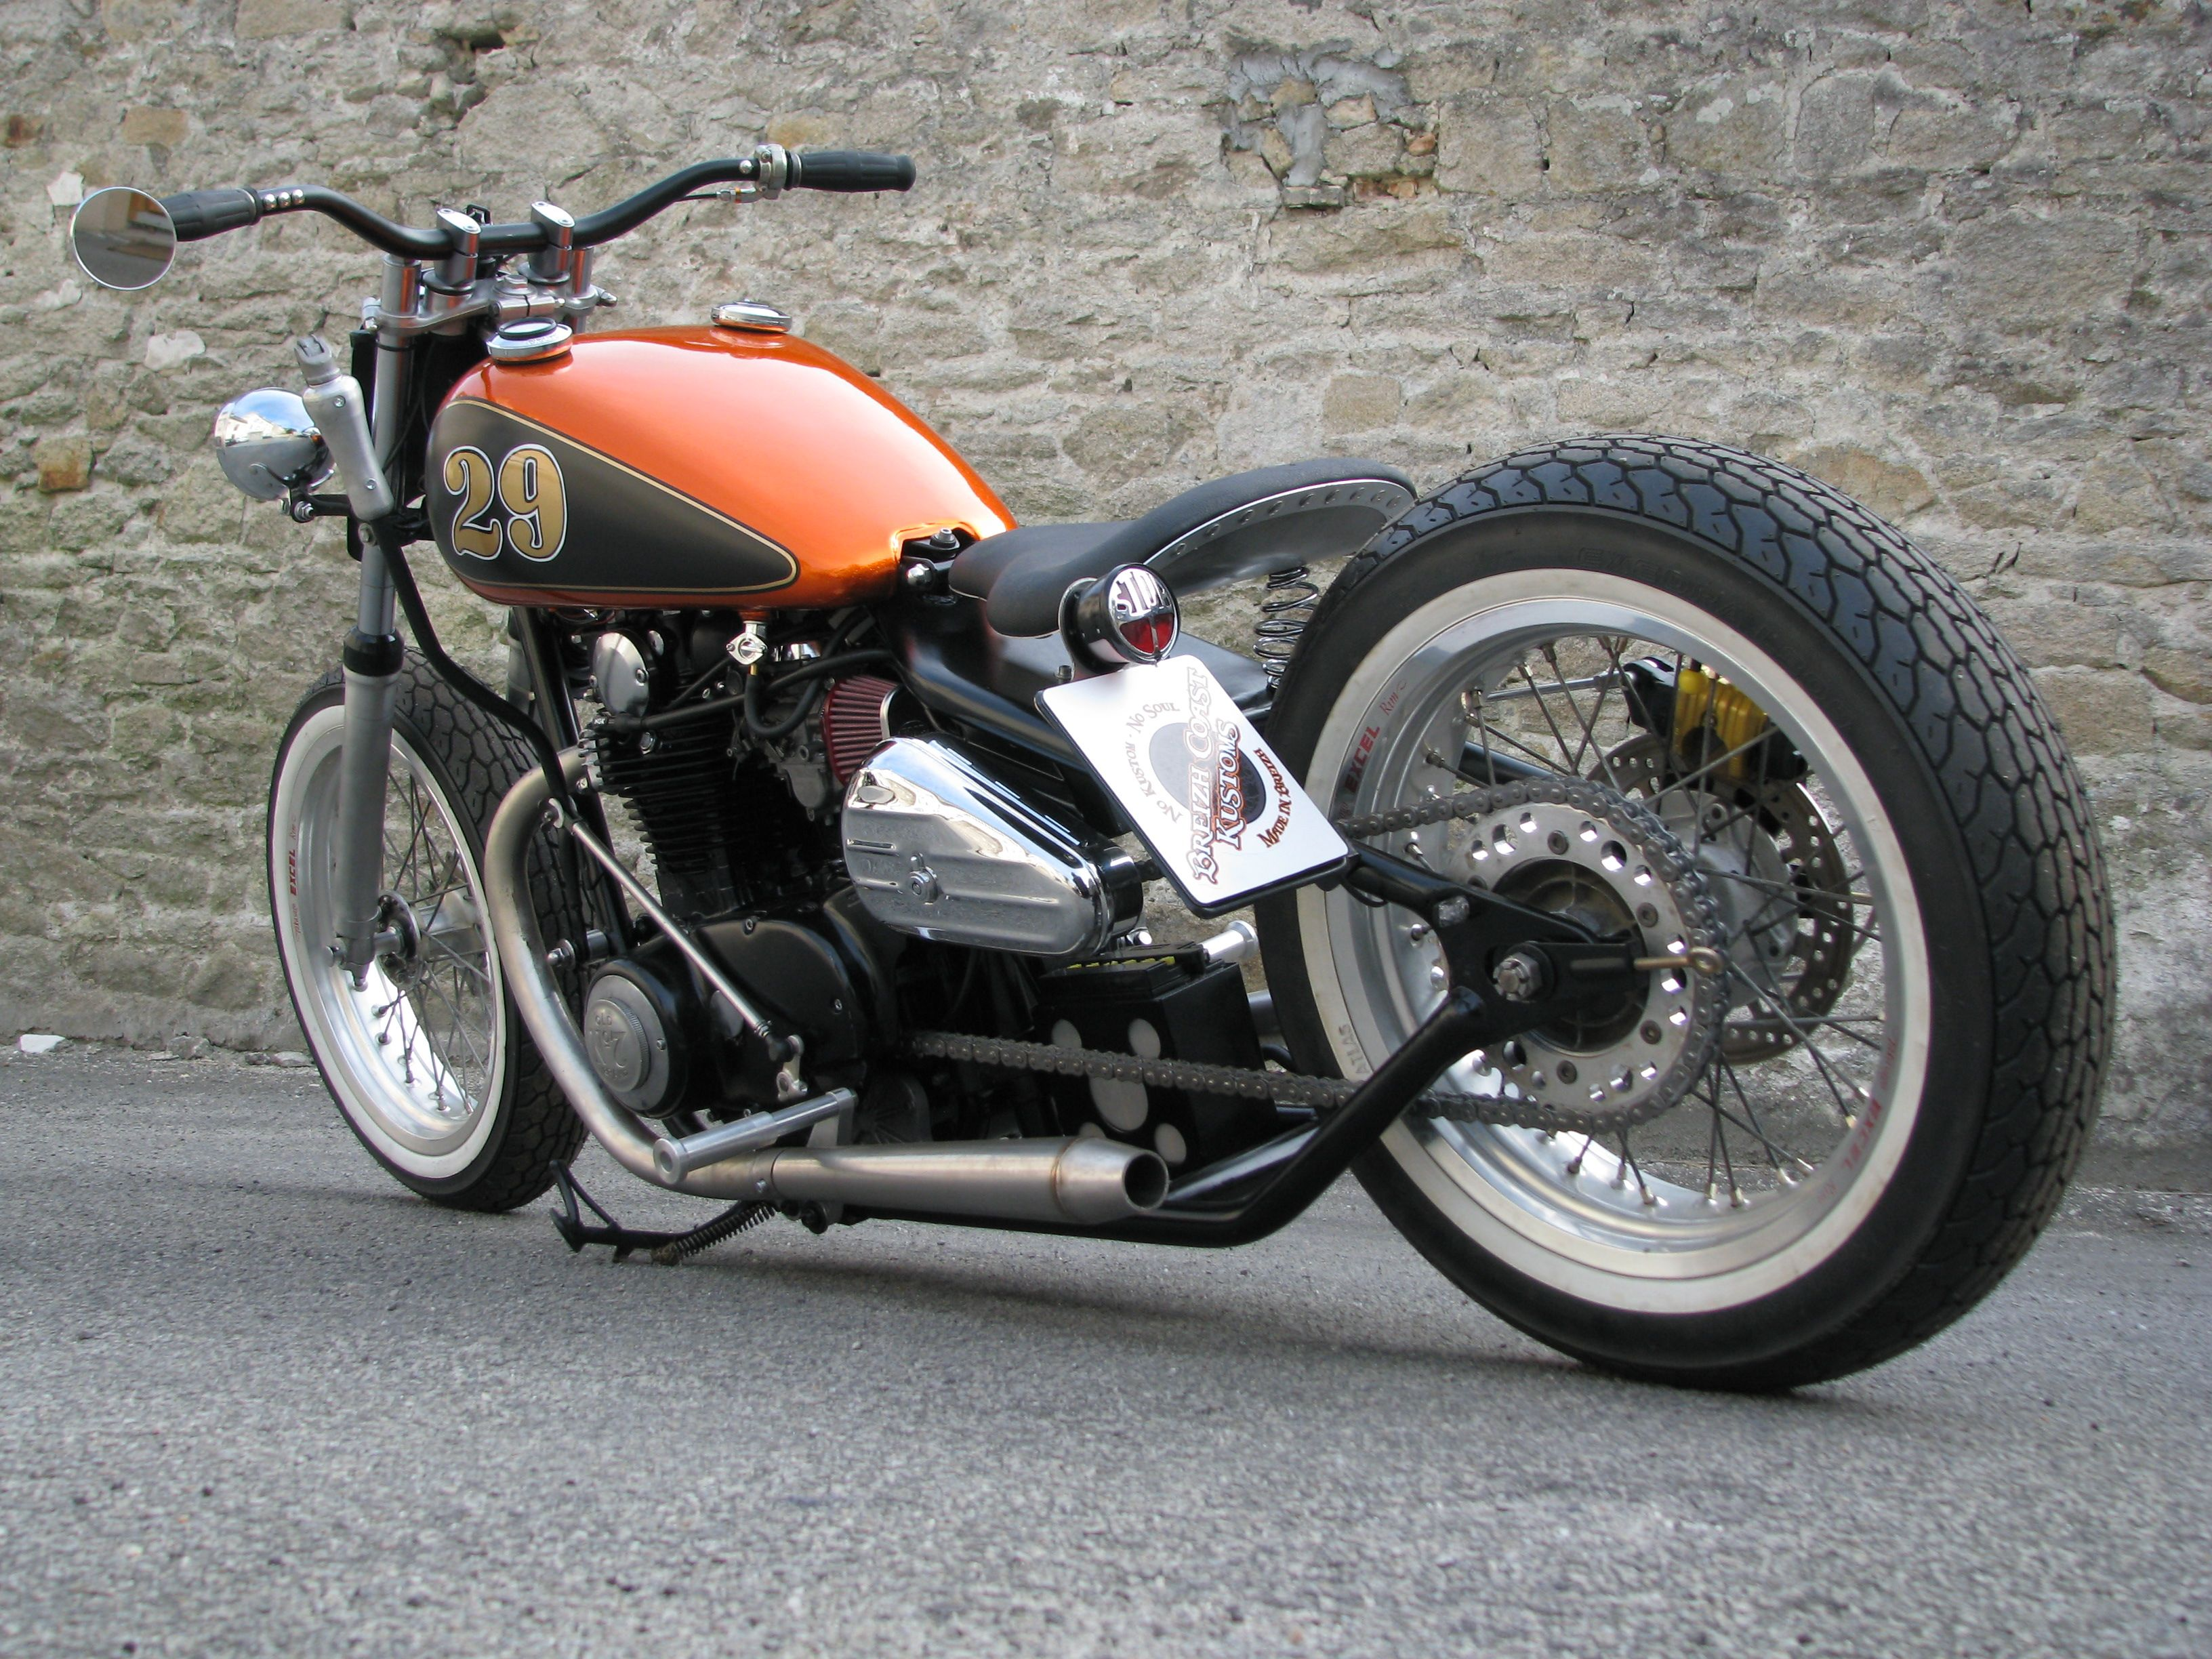 '82 Yamaha XS 650 Bobber made by Breizh Coast Kustoms #flattrack #streettracker #breizhcoastkustoms #yldconcepts #yamaha #xs650 #bobber #bckustoms